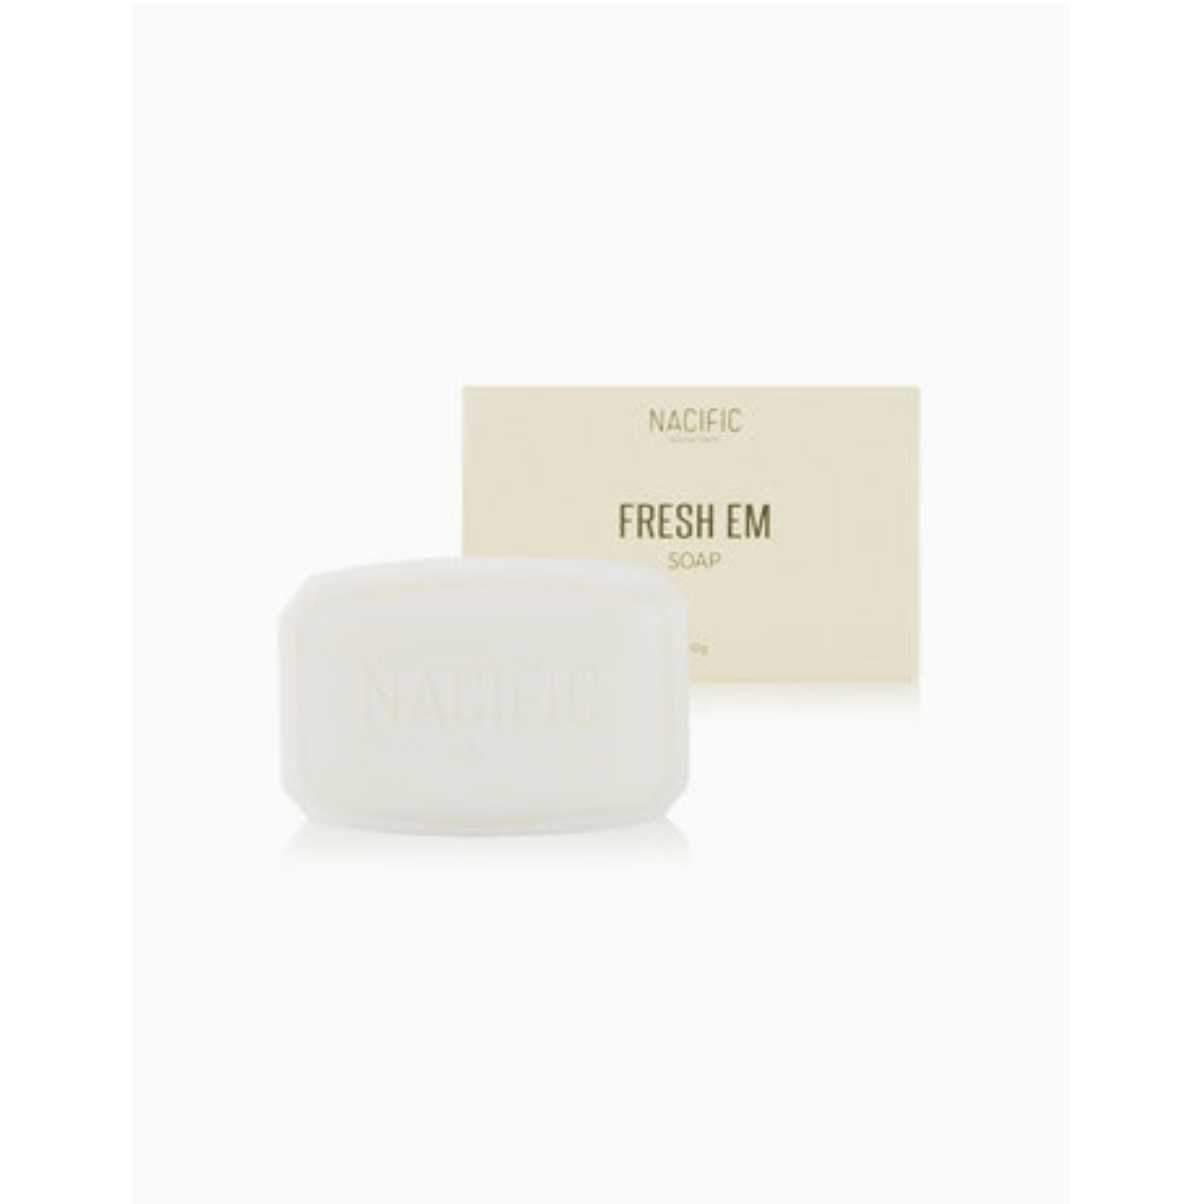 Nacific Fresh EM soap